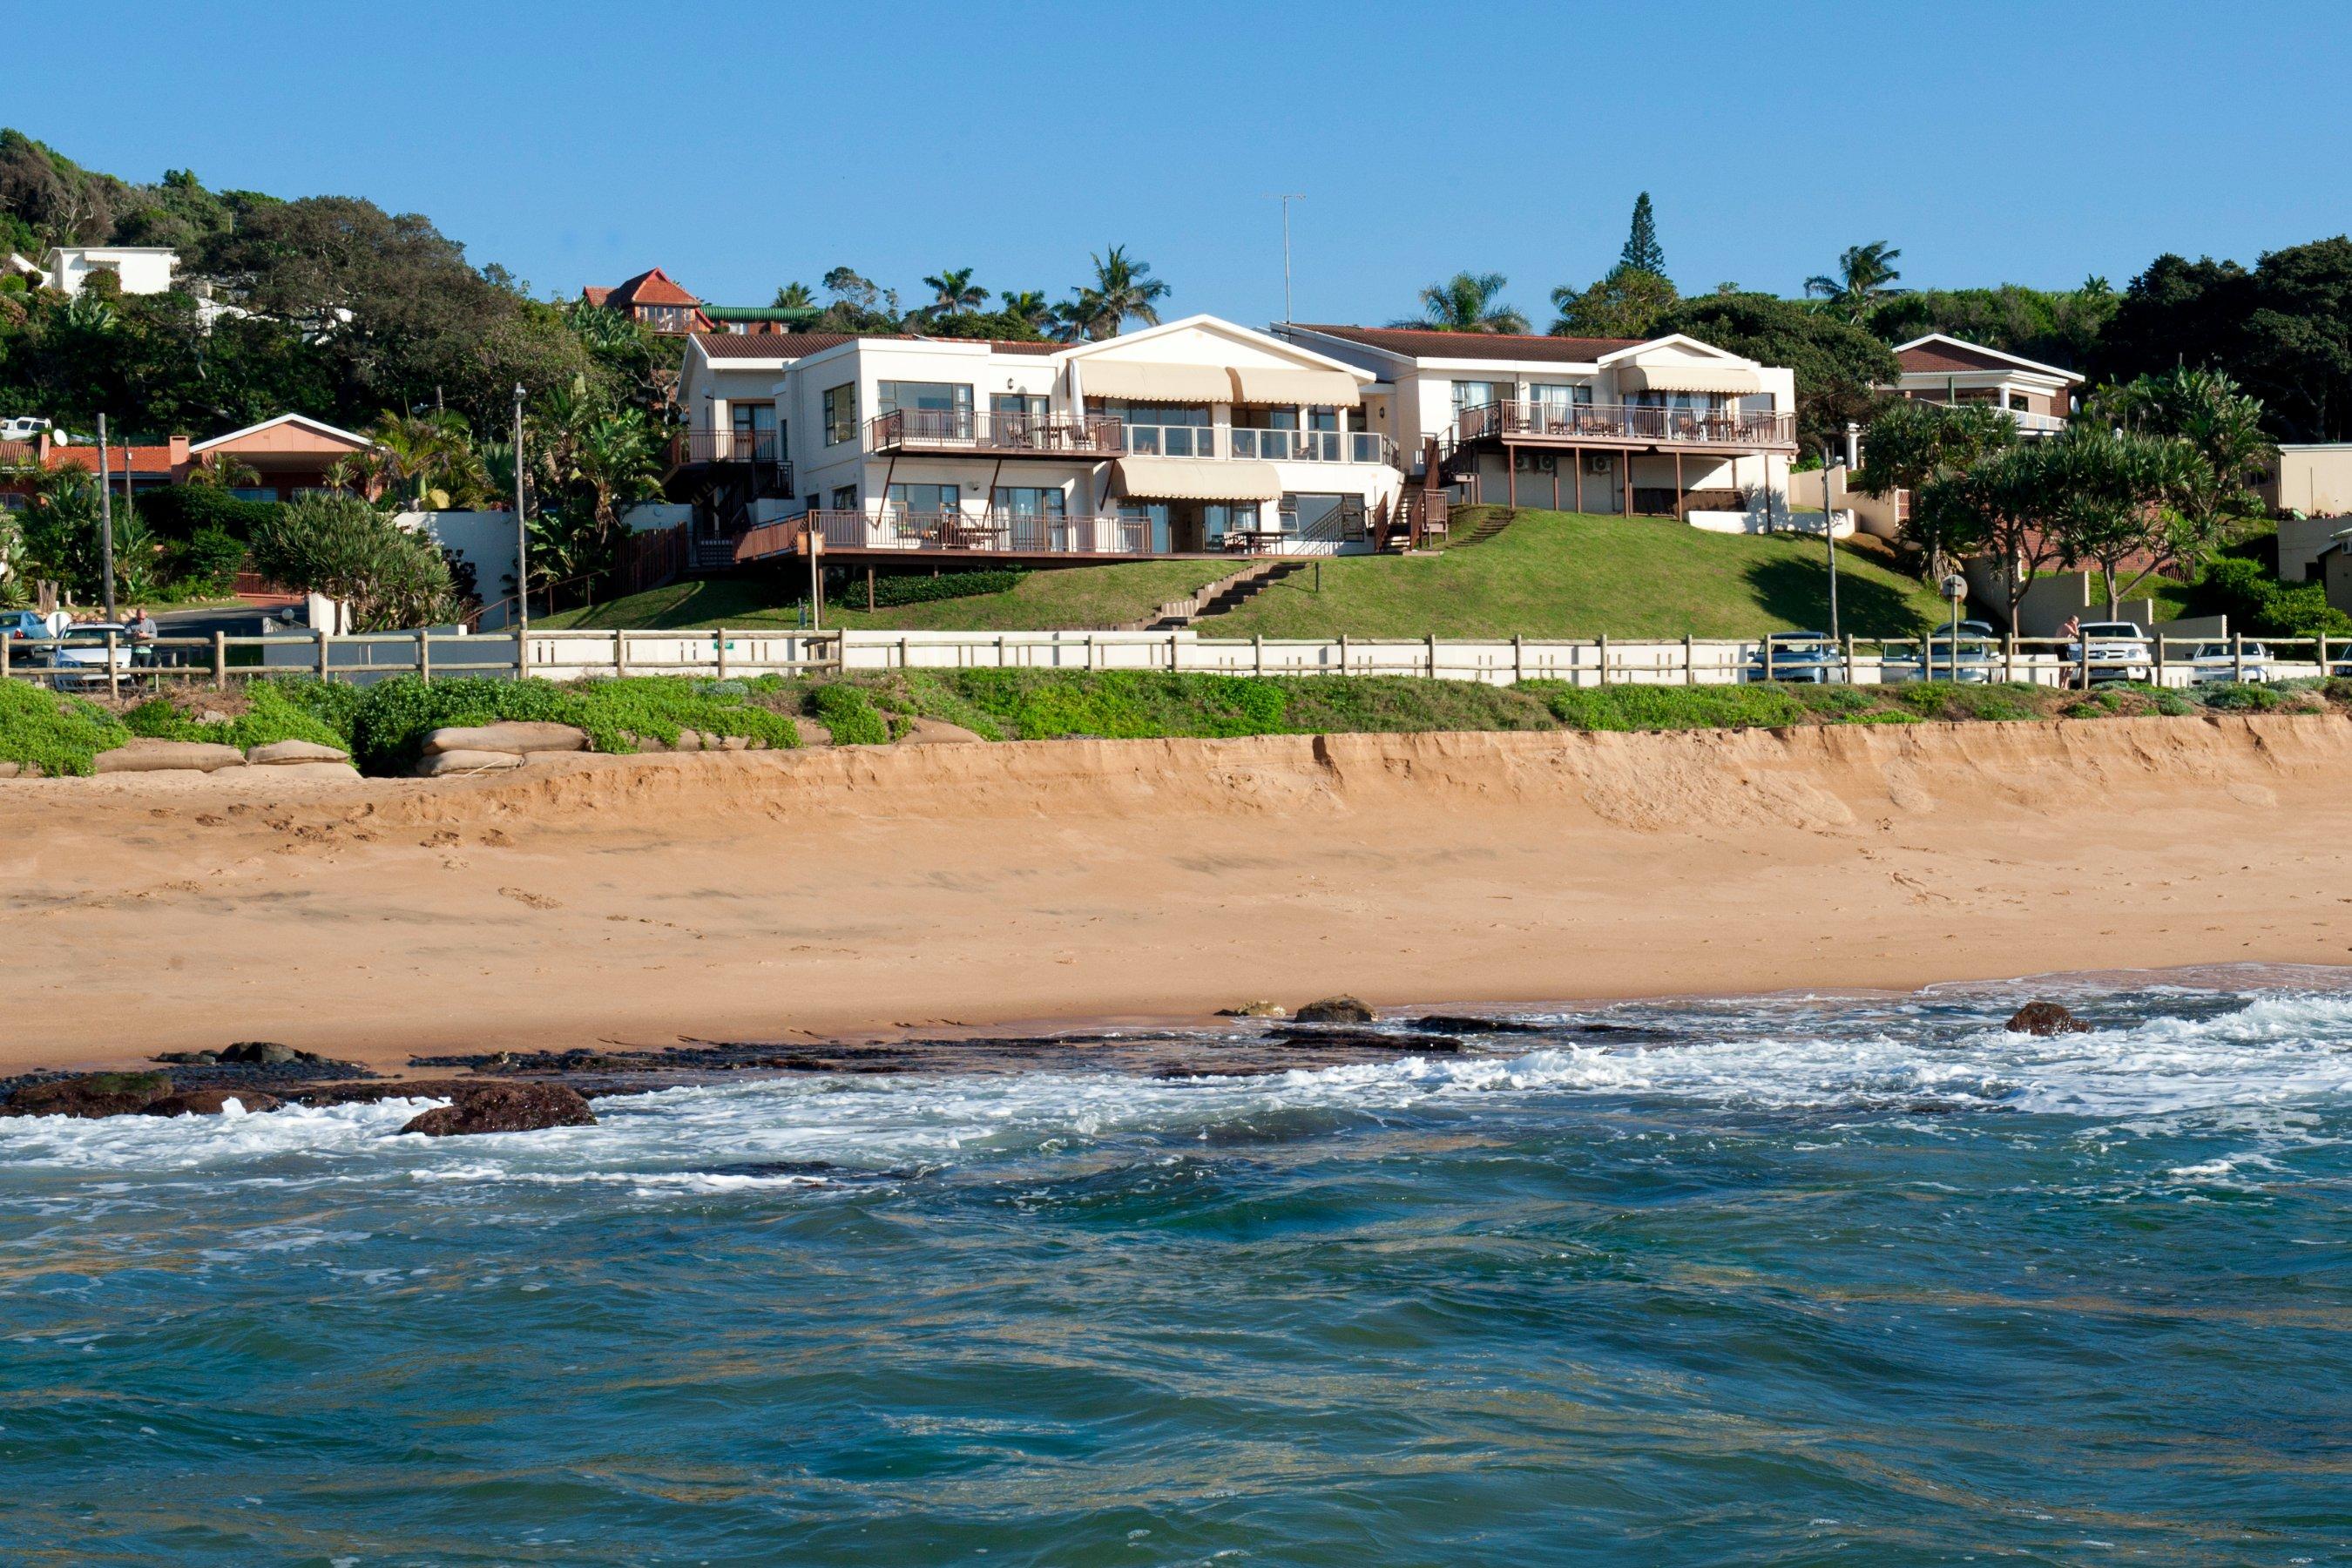 Fairlight Beach House Guest House Accommodation In Umdloti Durban